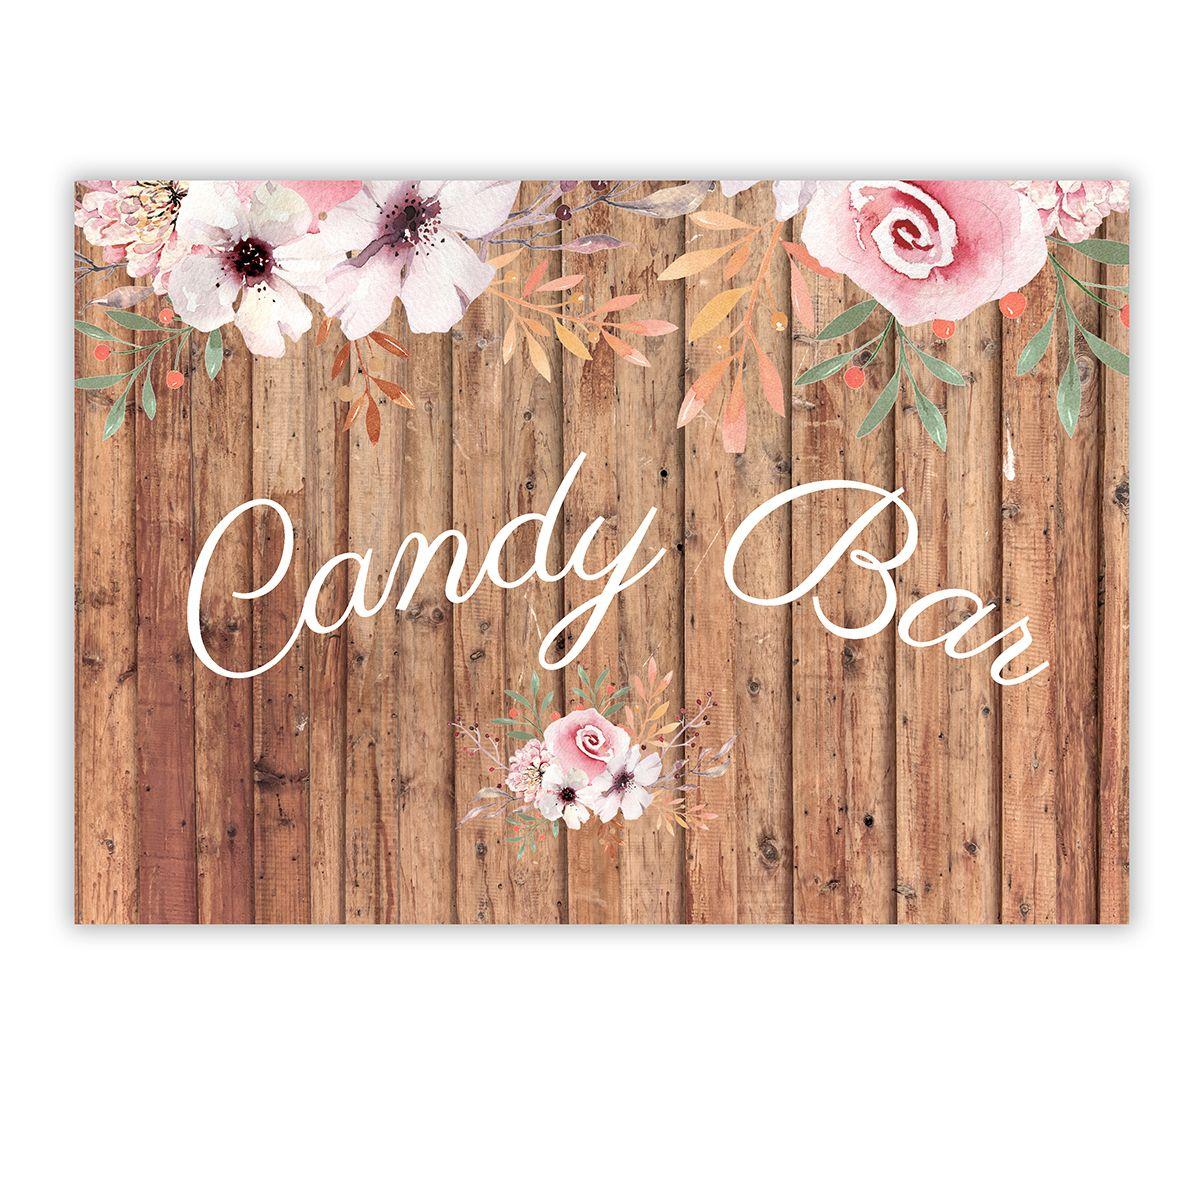 Cartel Candy Bar Winona A4